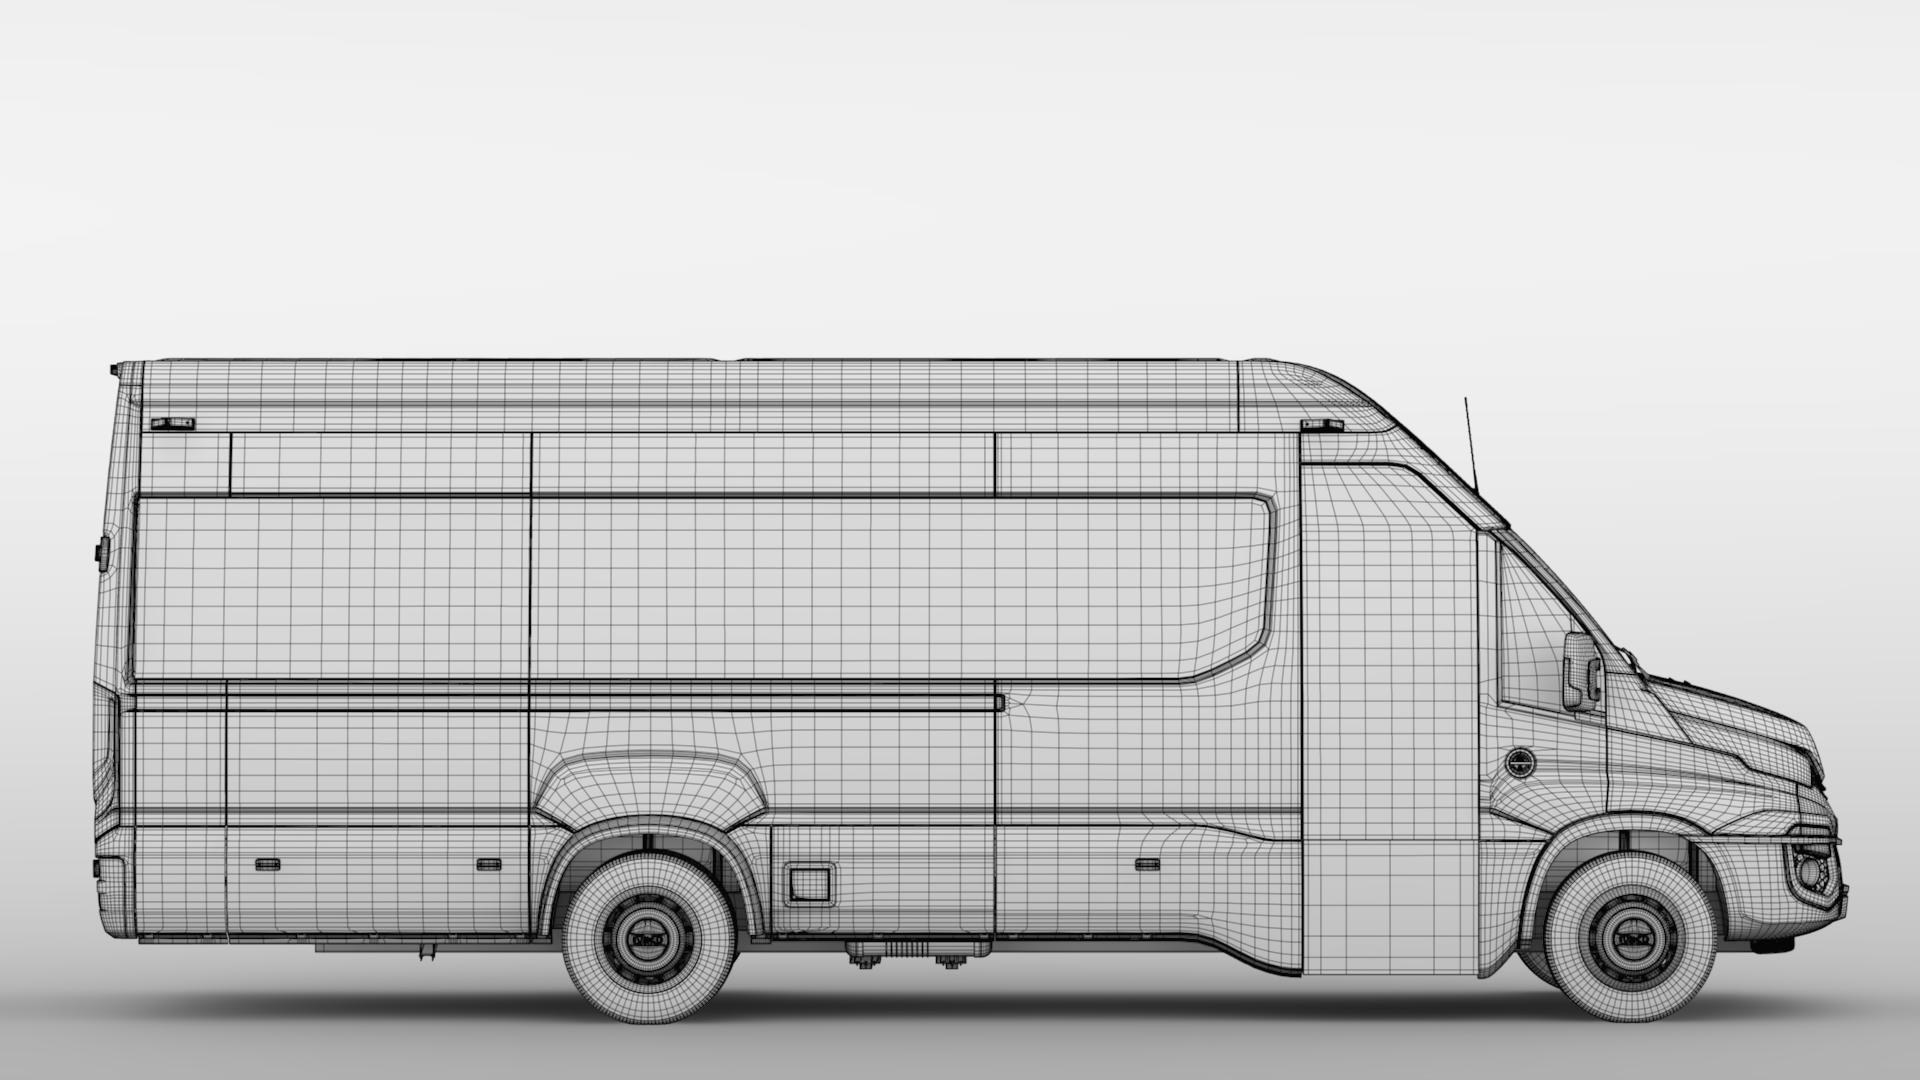 iveco daily tourus l5h3 2017 3d model max fbx c4d lwo ma mb hrc xsi obj 275633